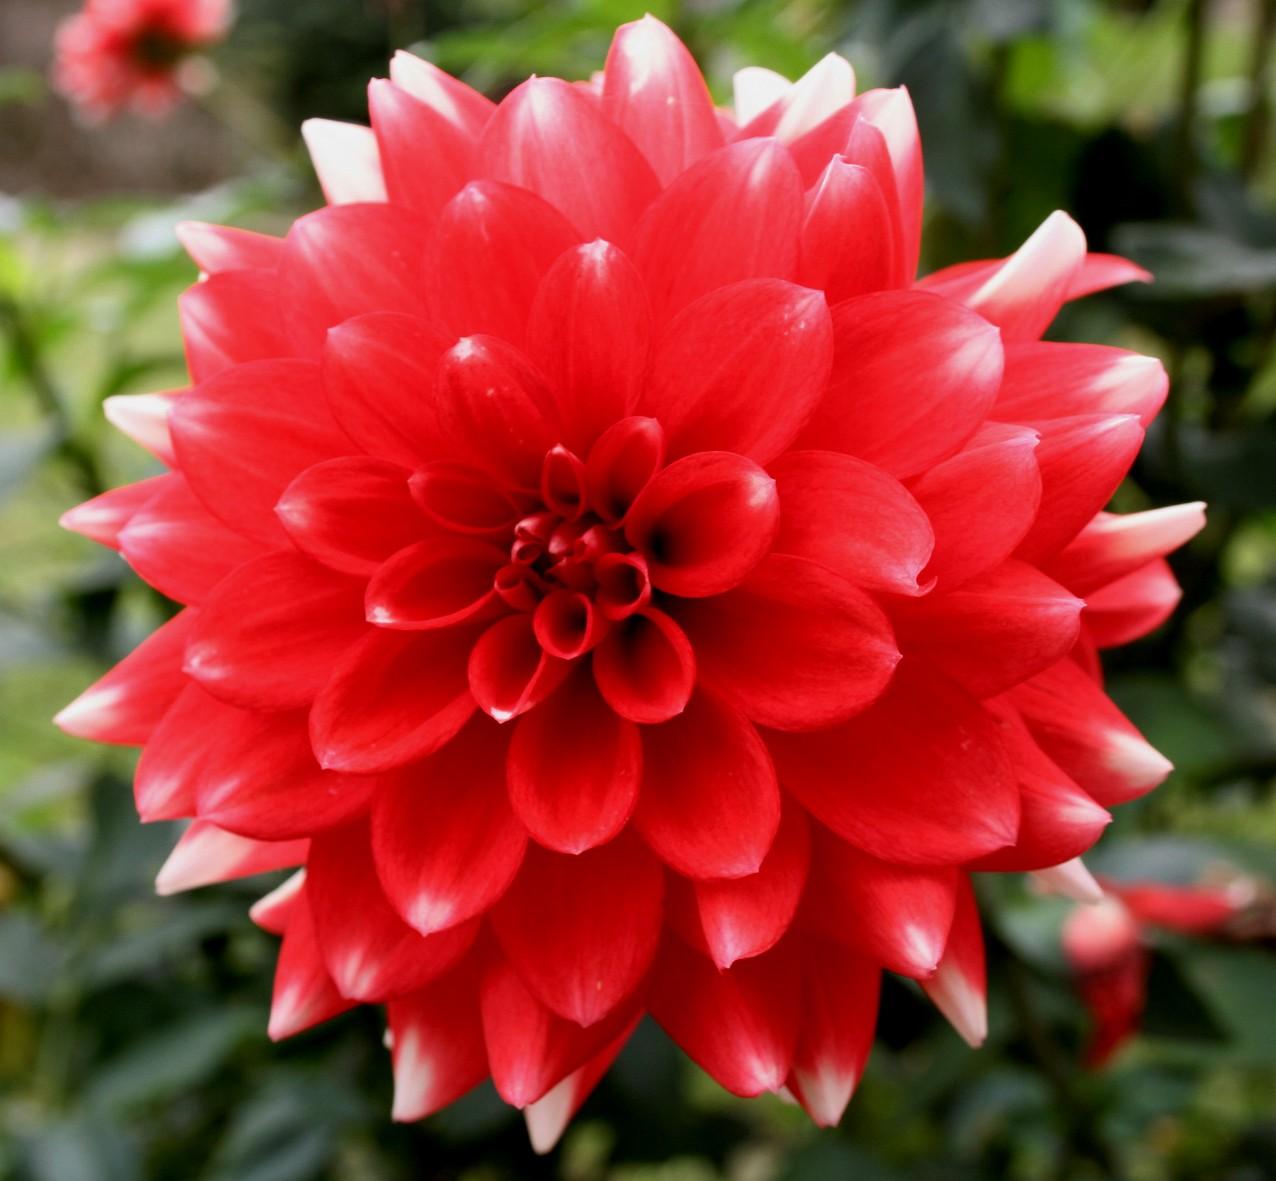 fleurs - tubercule - dahlia rouge asteraceae compositae dahlia